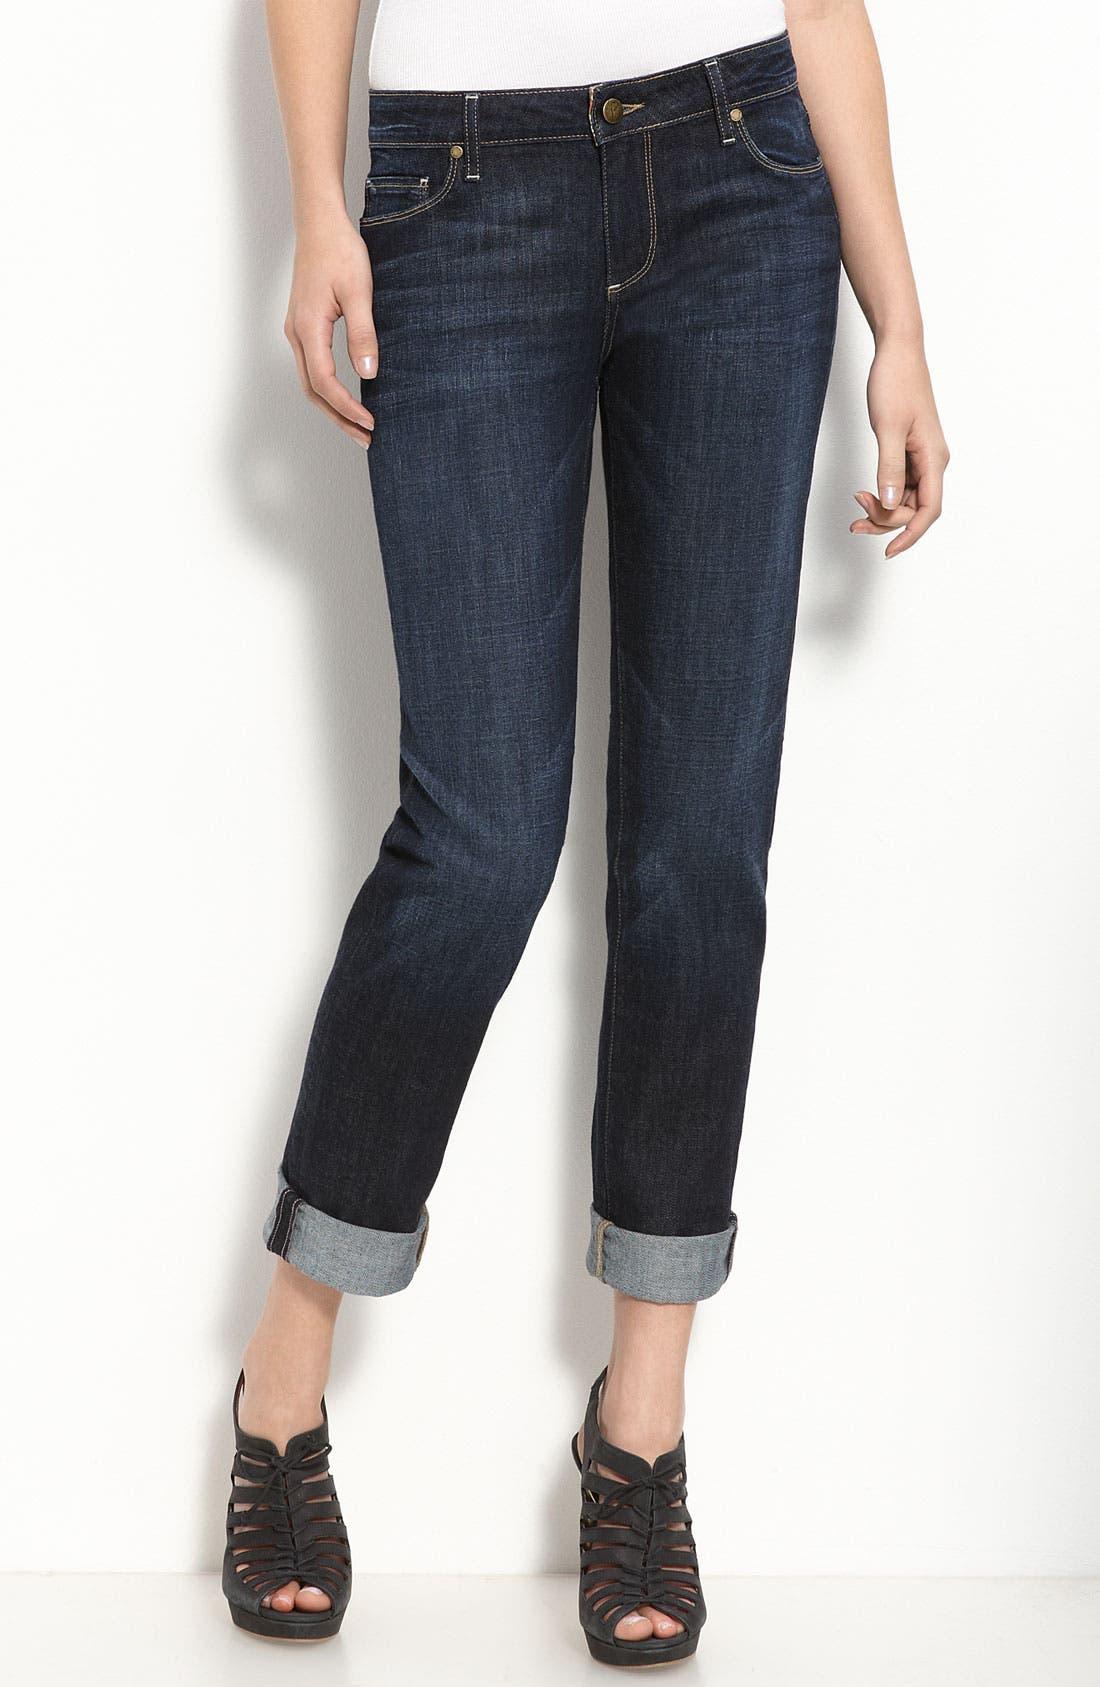 Alternate Image 1 Selected - Paige Denim 'Jimmy Jimmy' Stretch Jeans